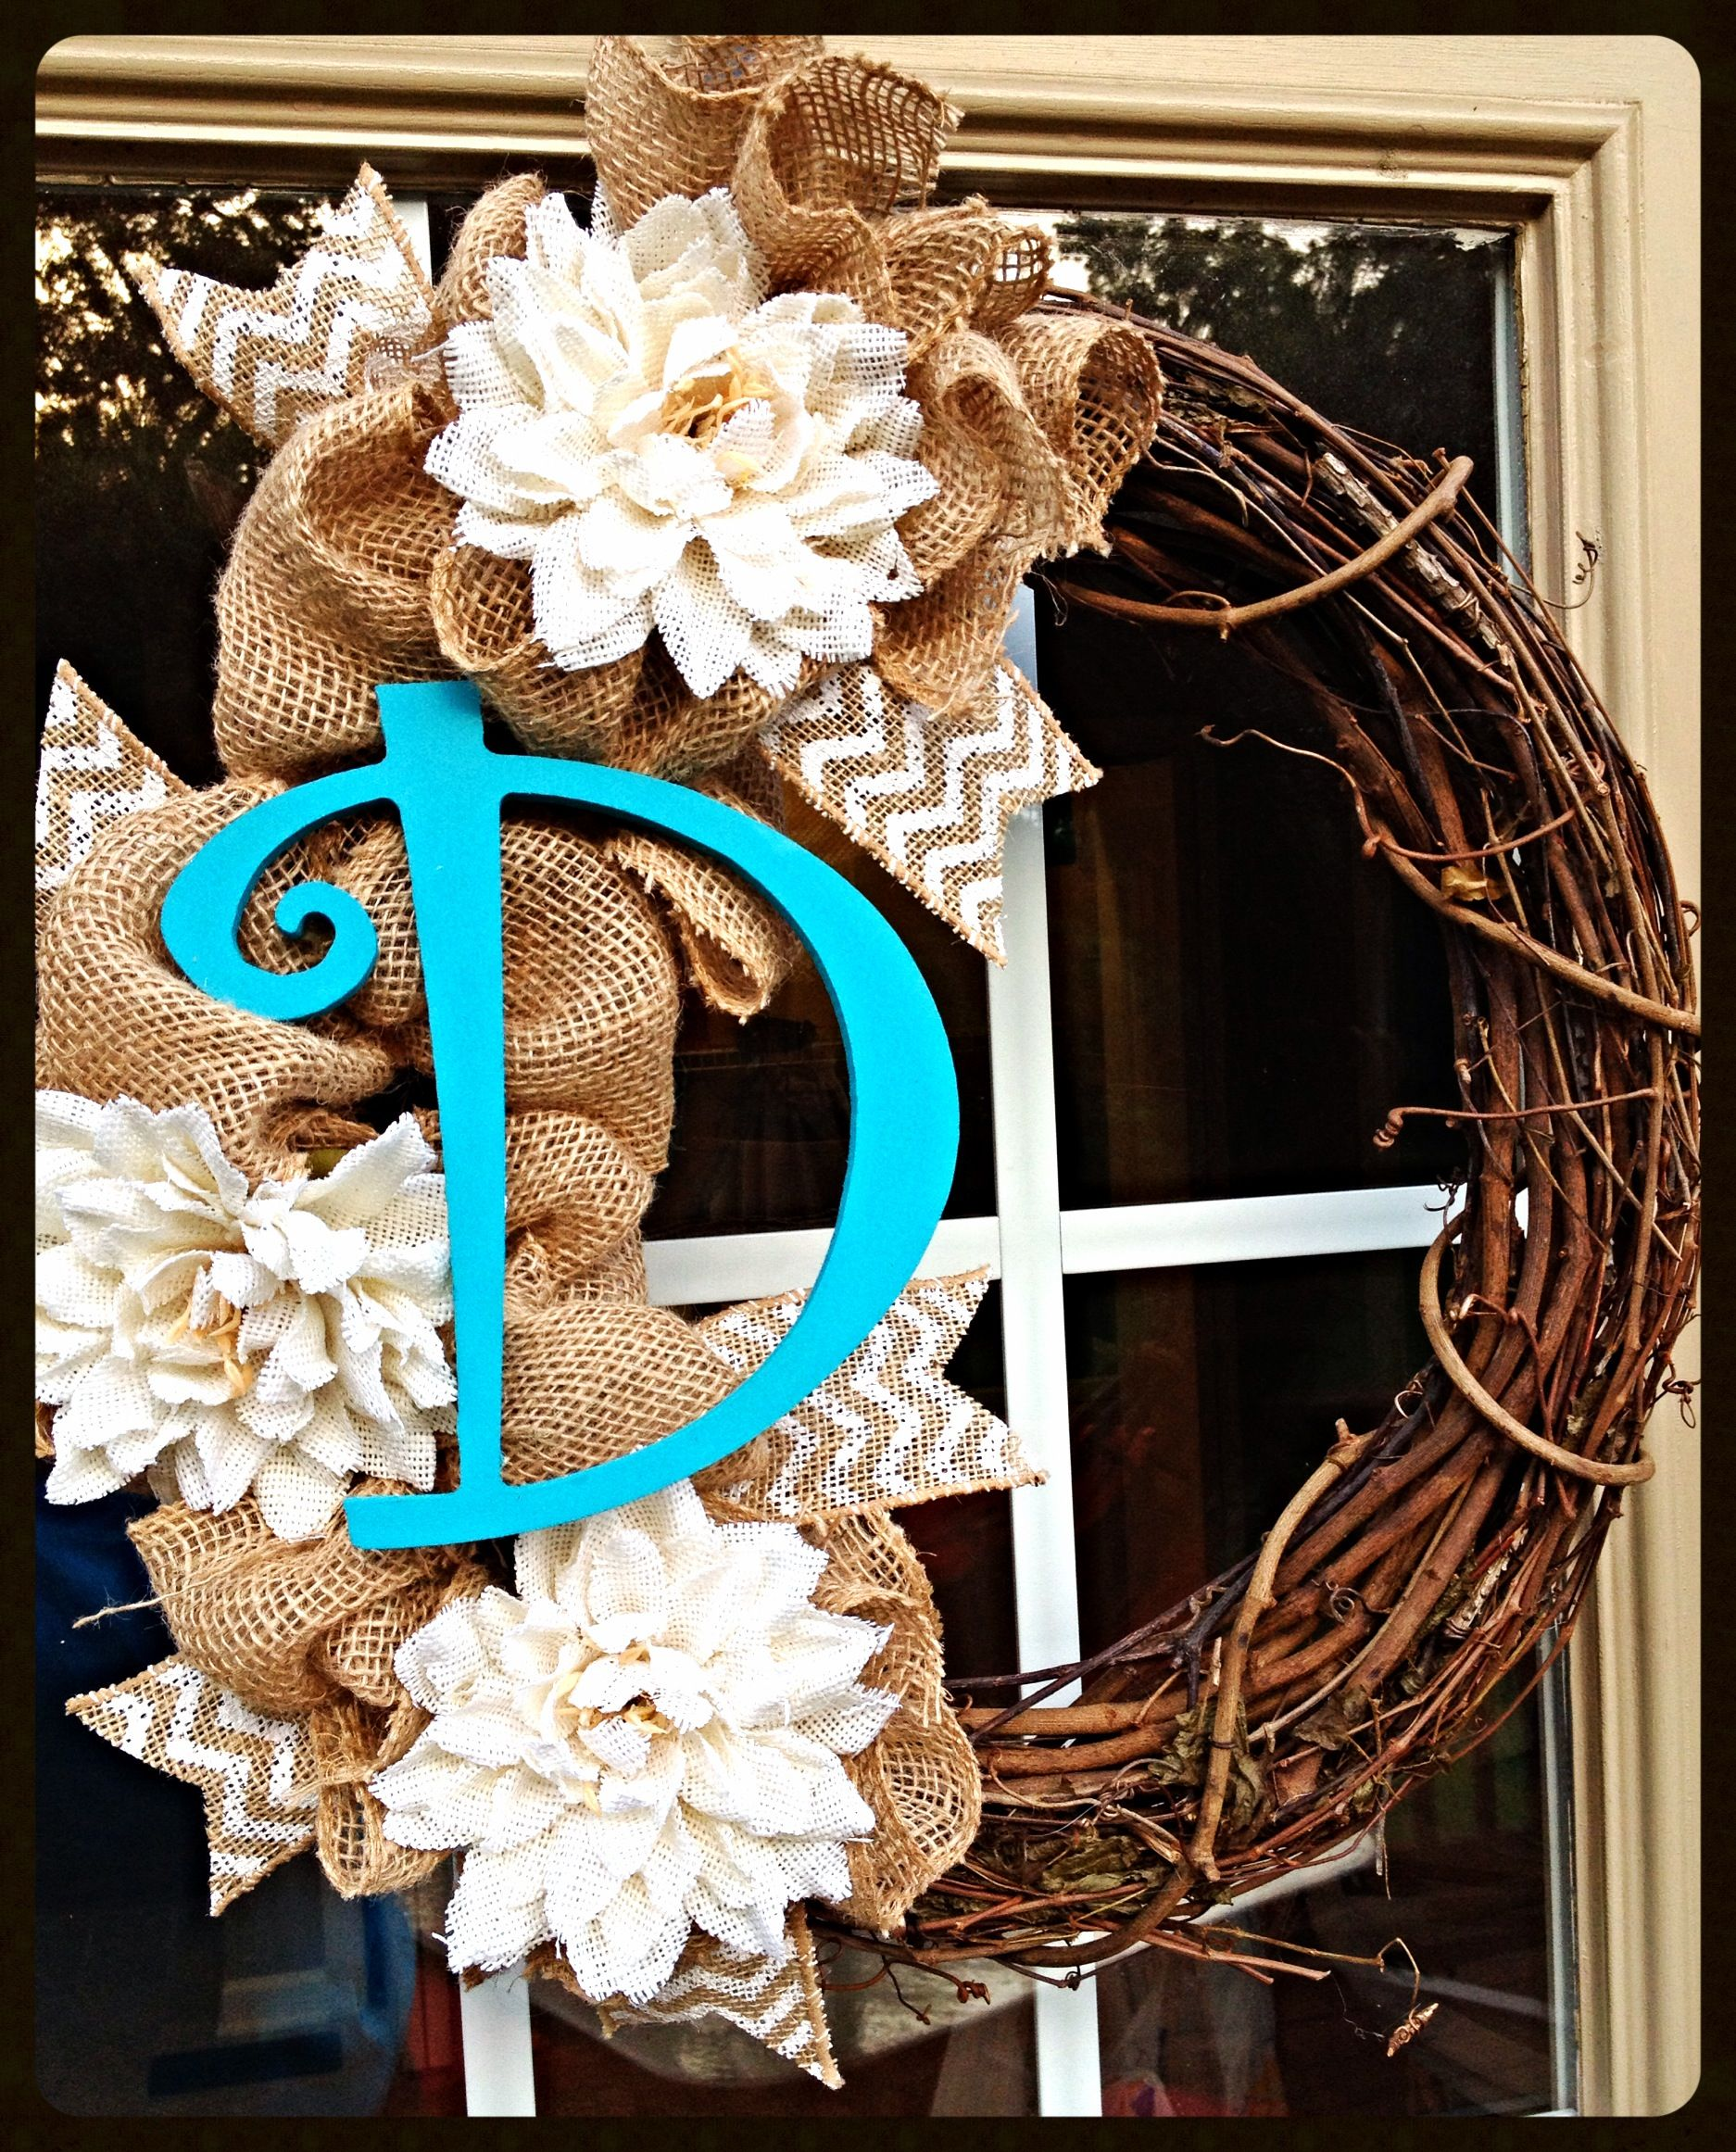 Burlap Wreath Designs By Karrie Crafts Burlap Crafts Diy Wreath